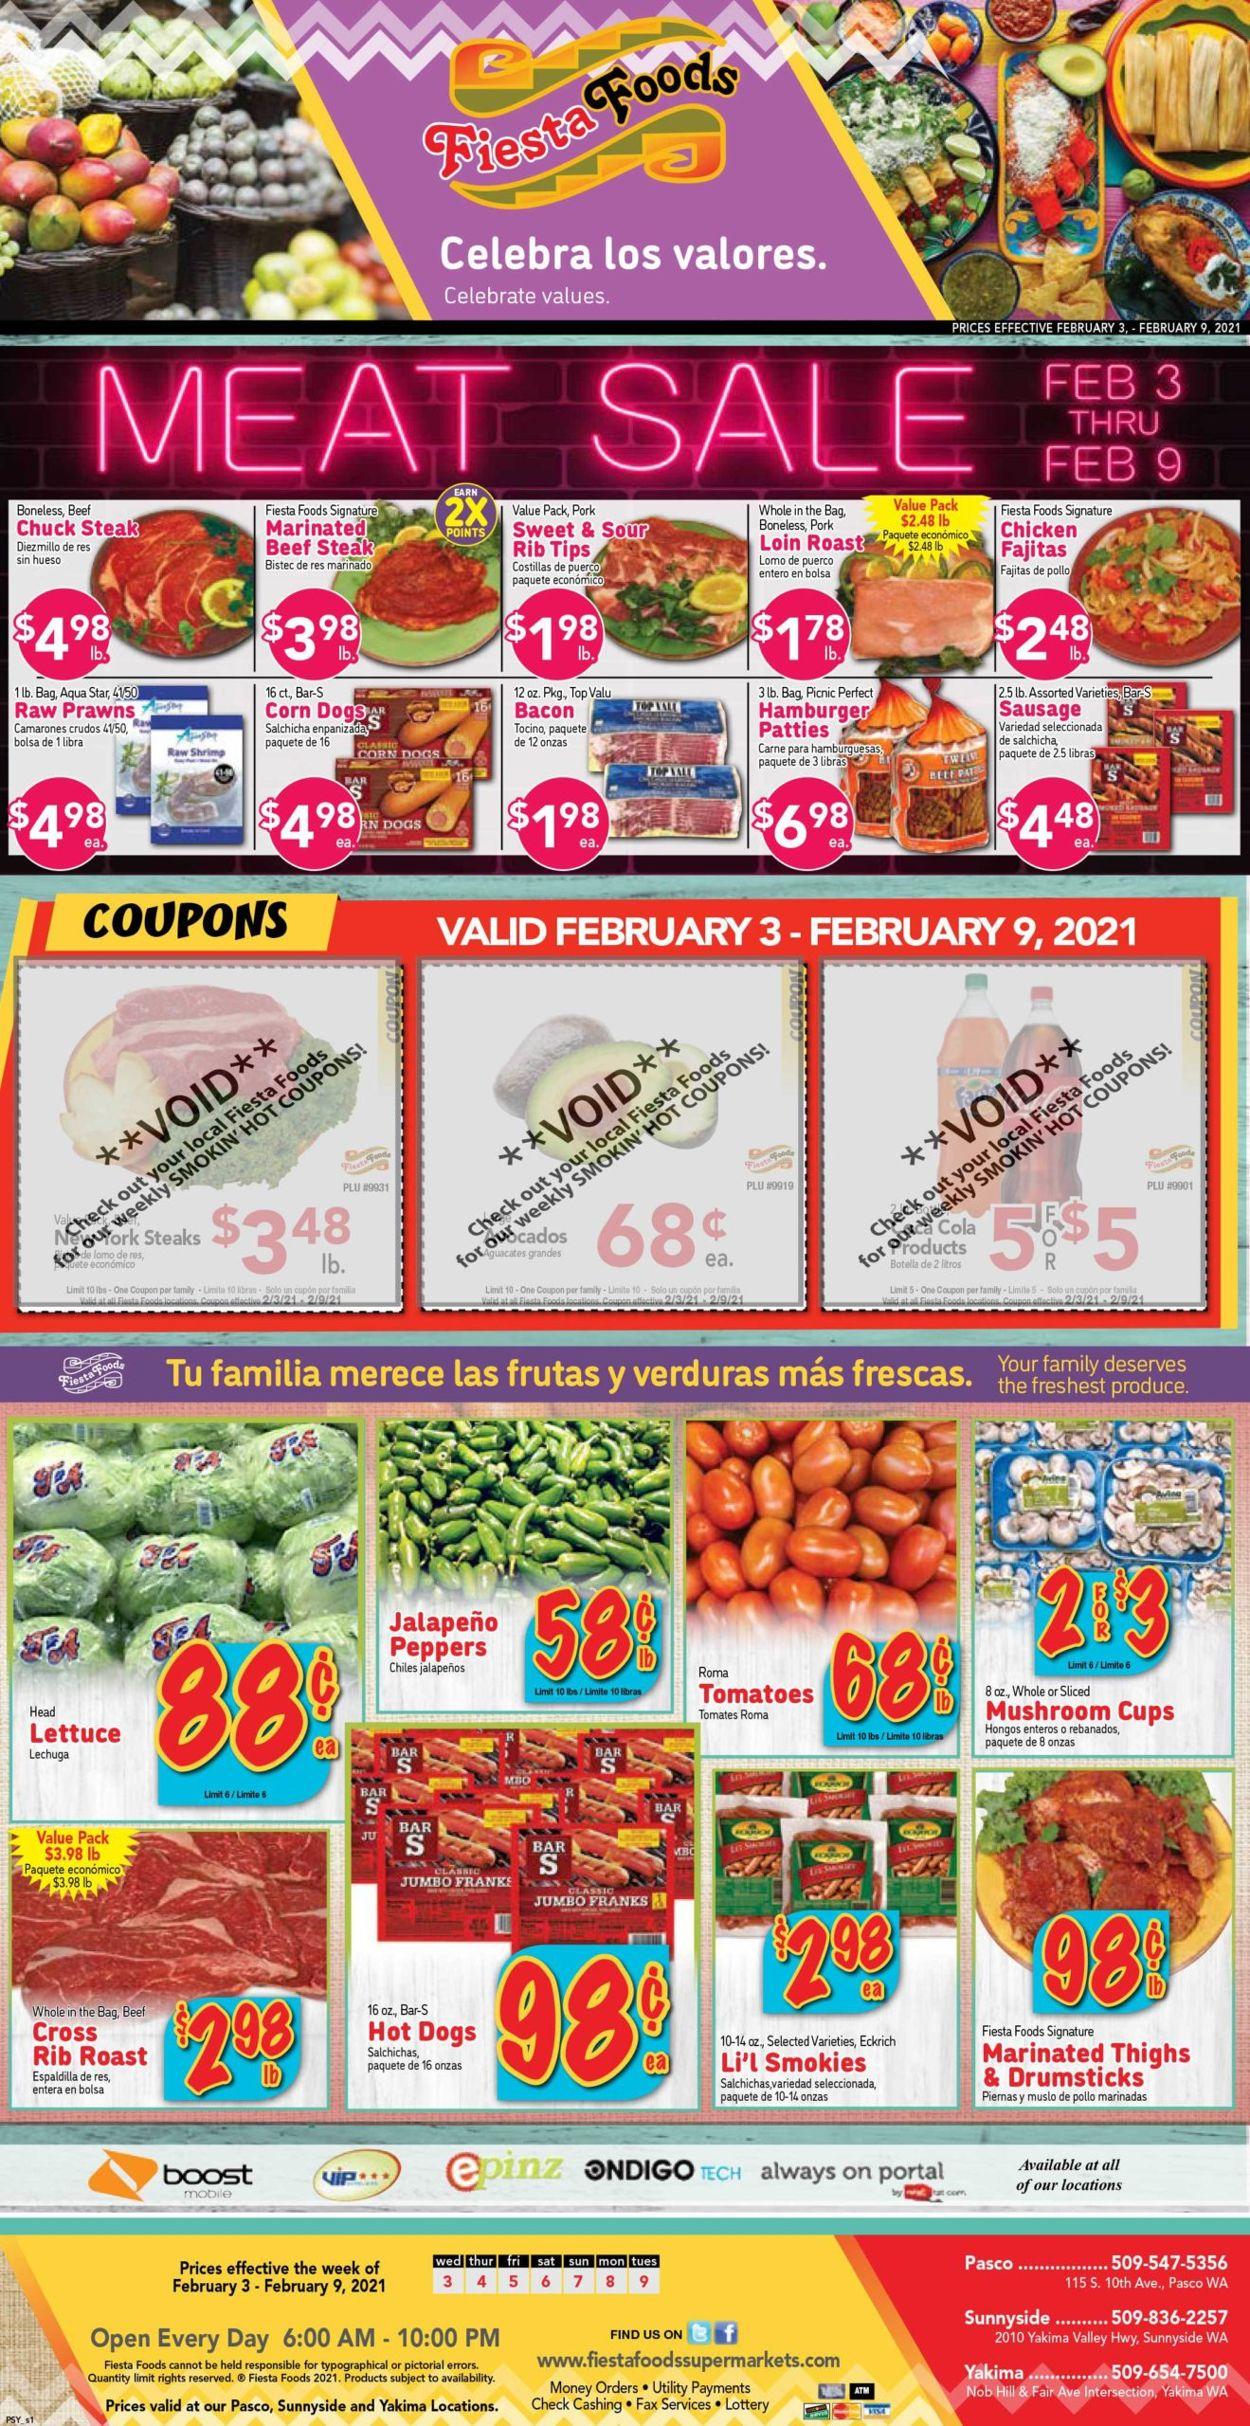 Fiesta Foods SuperMarkets Weekly Ad Circular - valid 02/03-02/09/2021